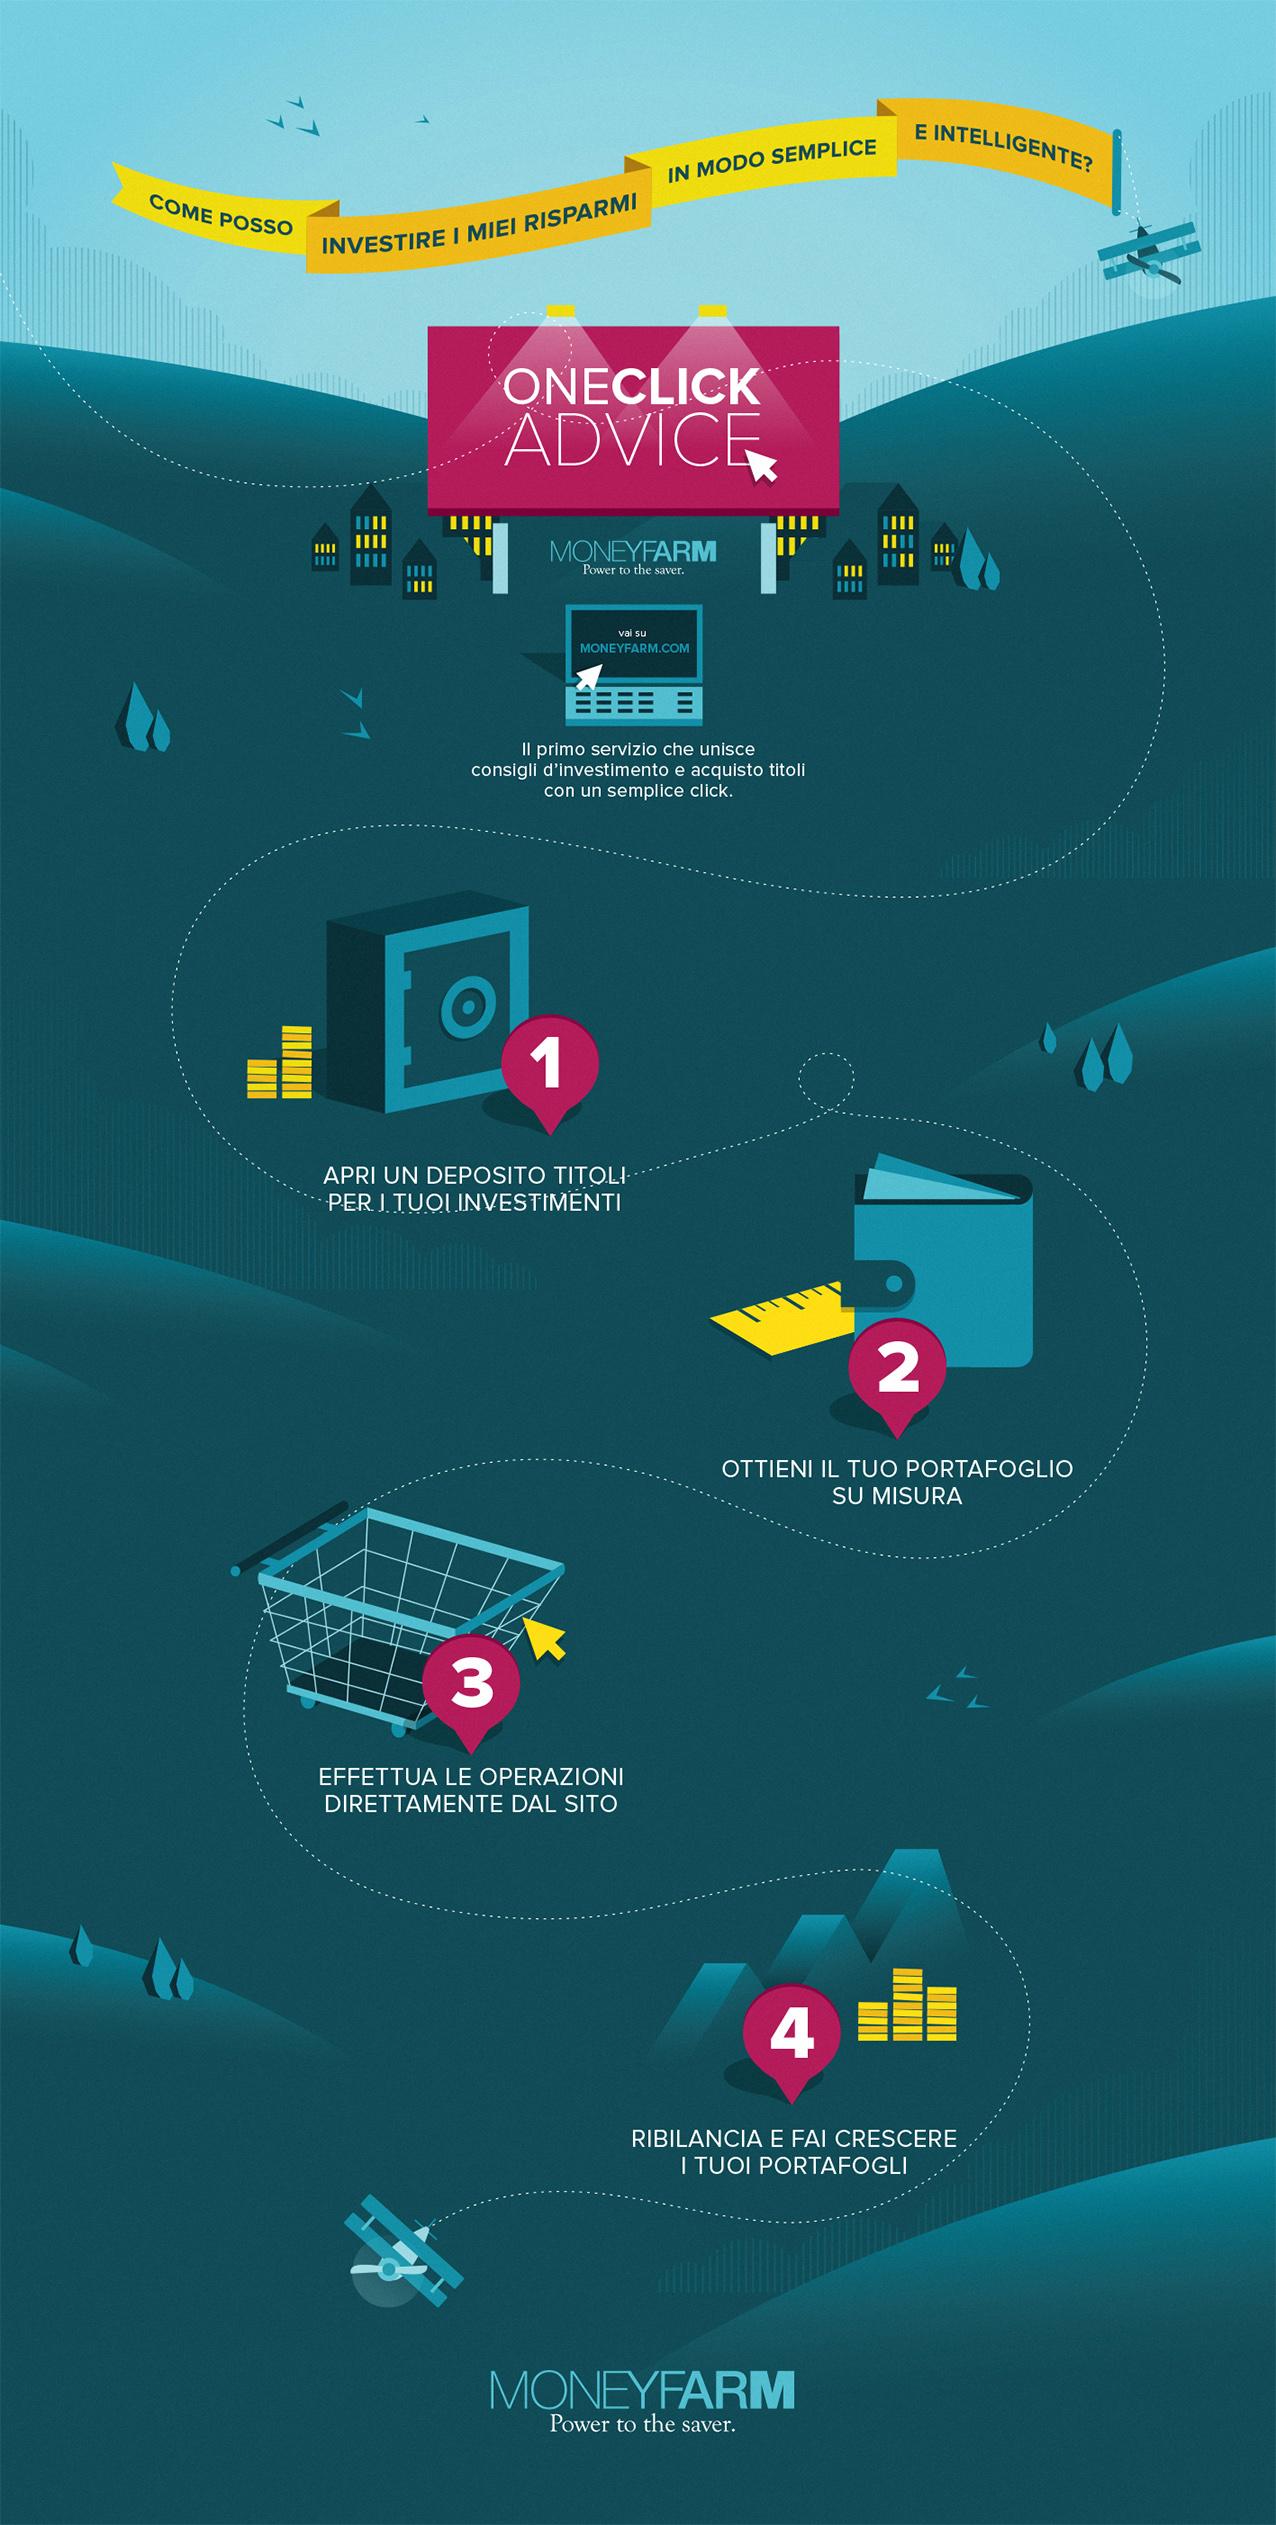 oneclick advice infografica